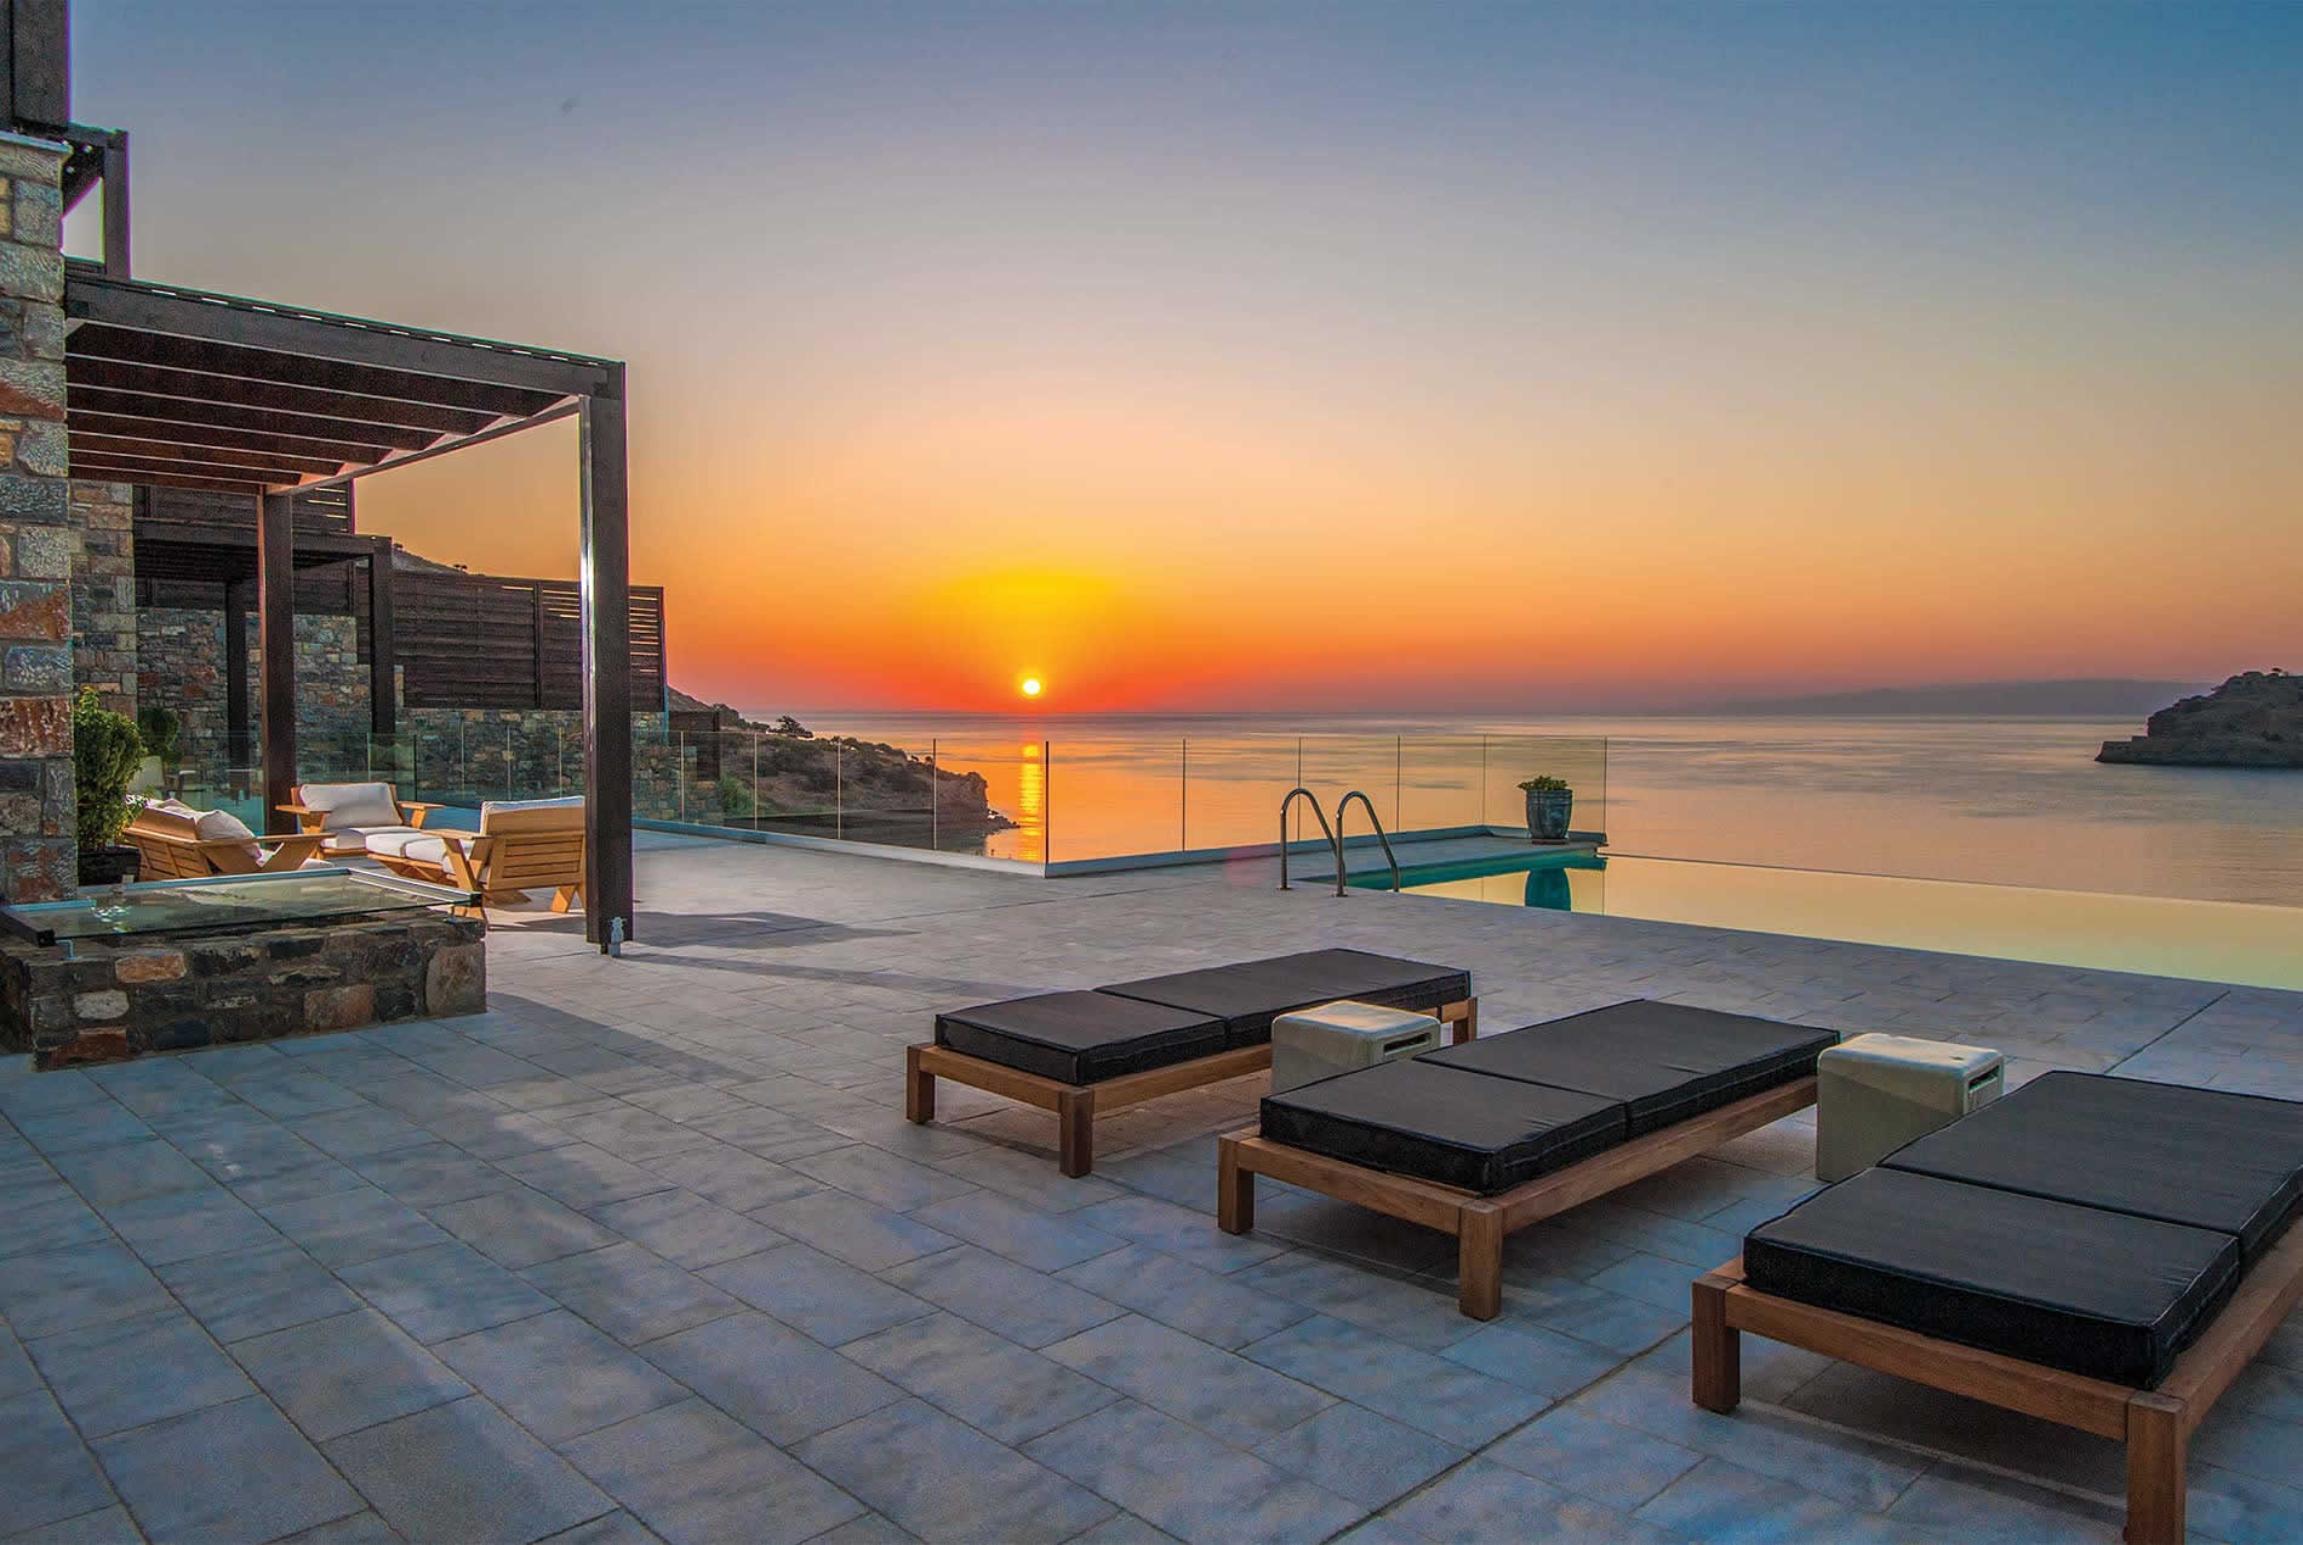 Ferienhaus Danae (2654195), Plaka, Kreta Nordküste, Kreta, Griechenland, Bild 30